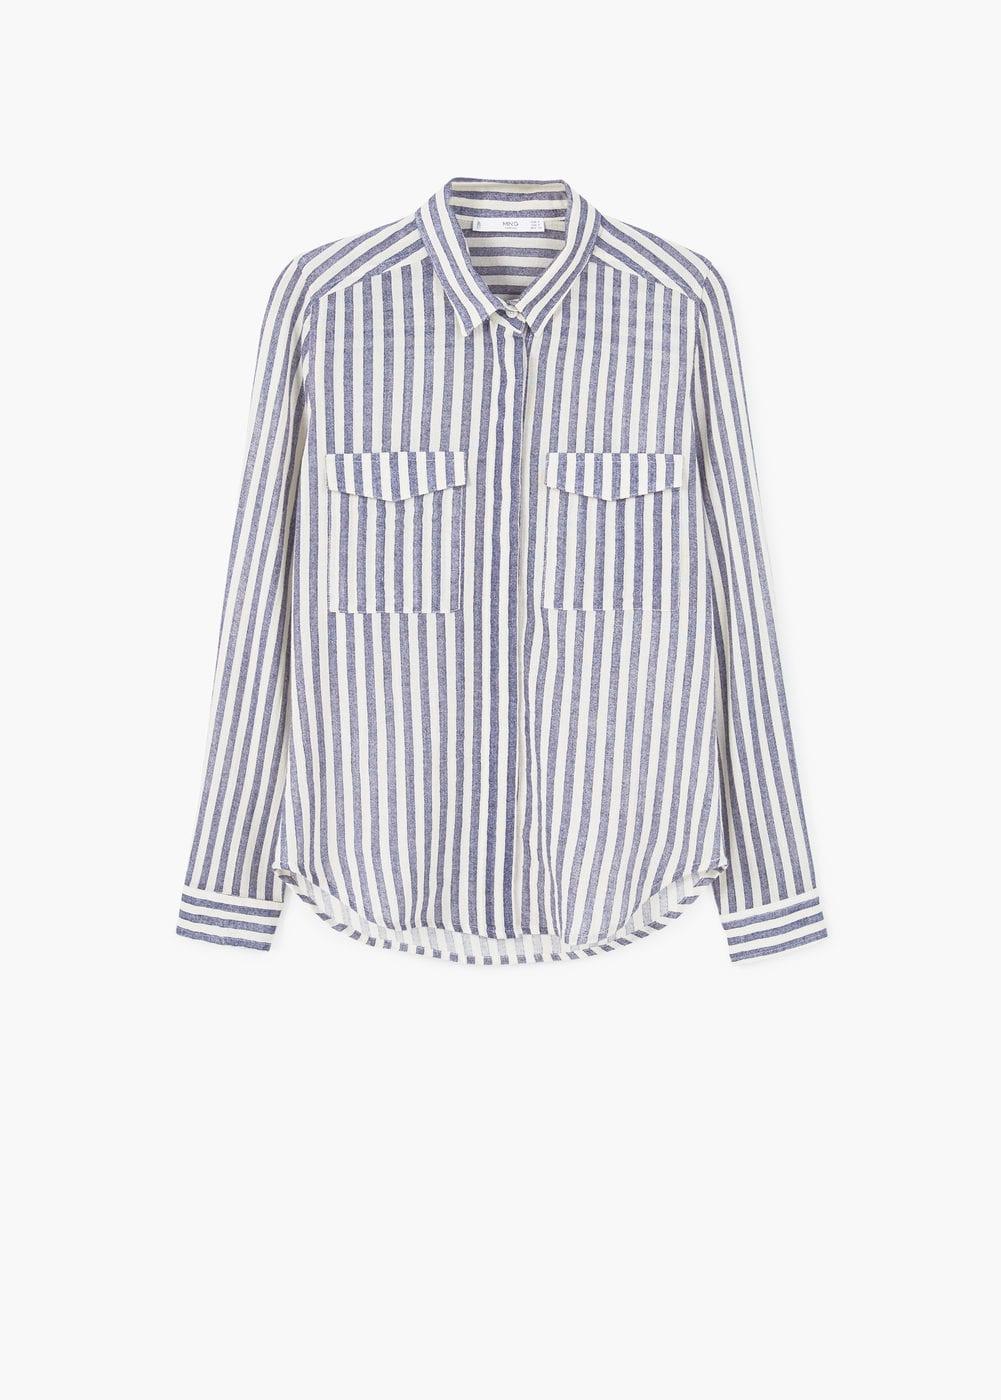 MAngo Striped Shirt $39.99